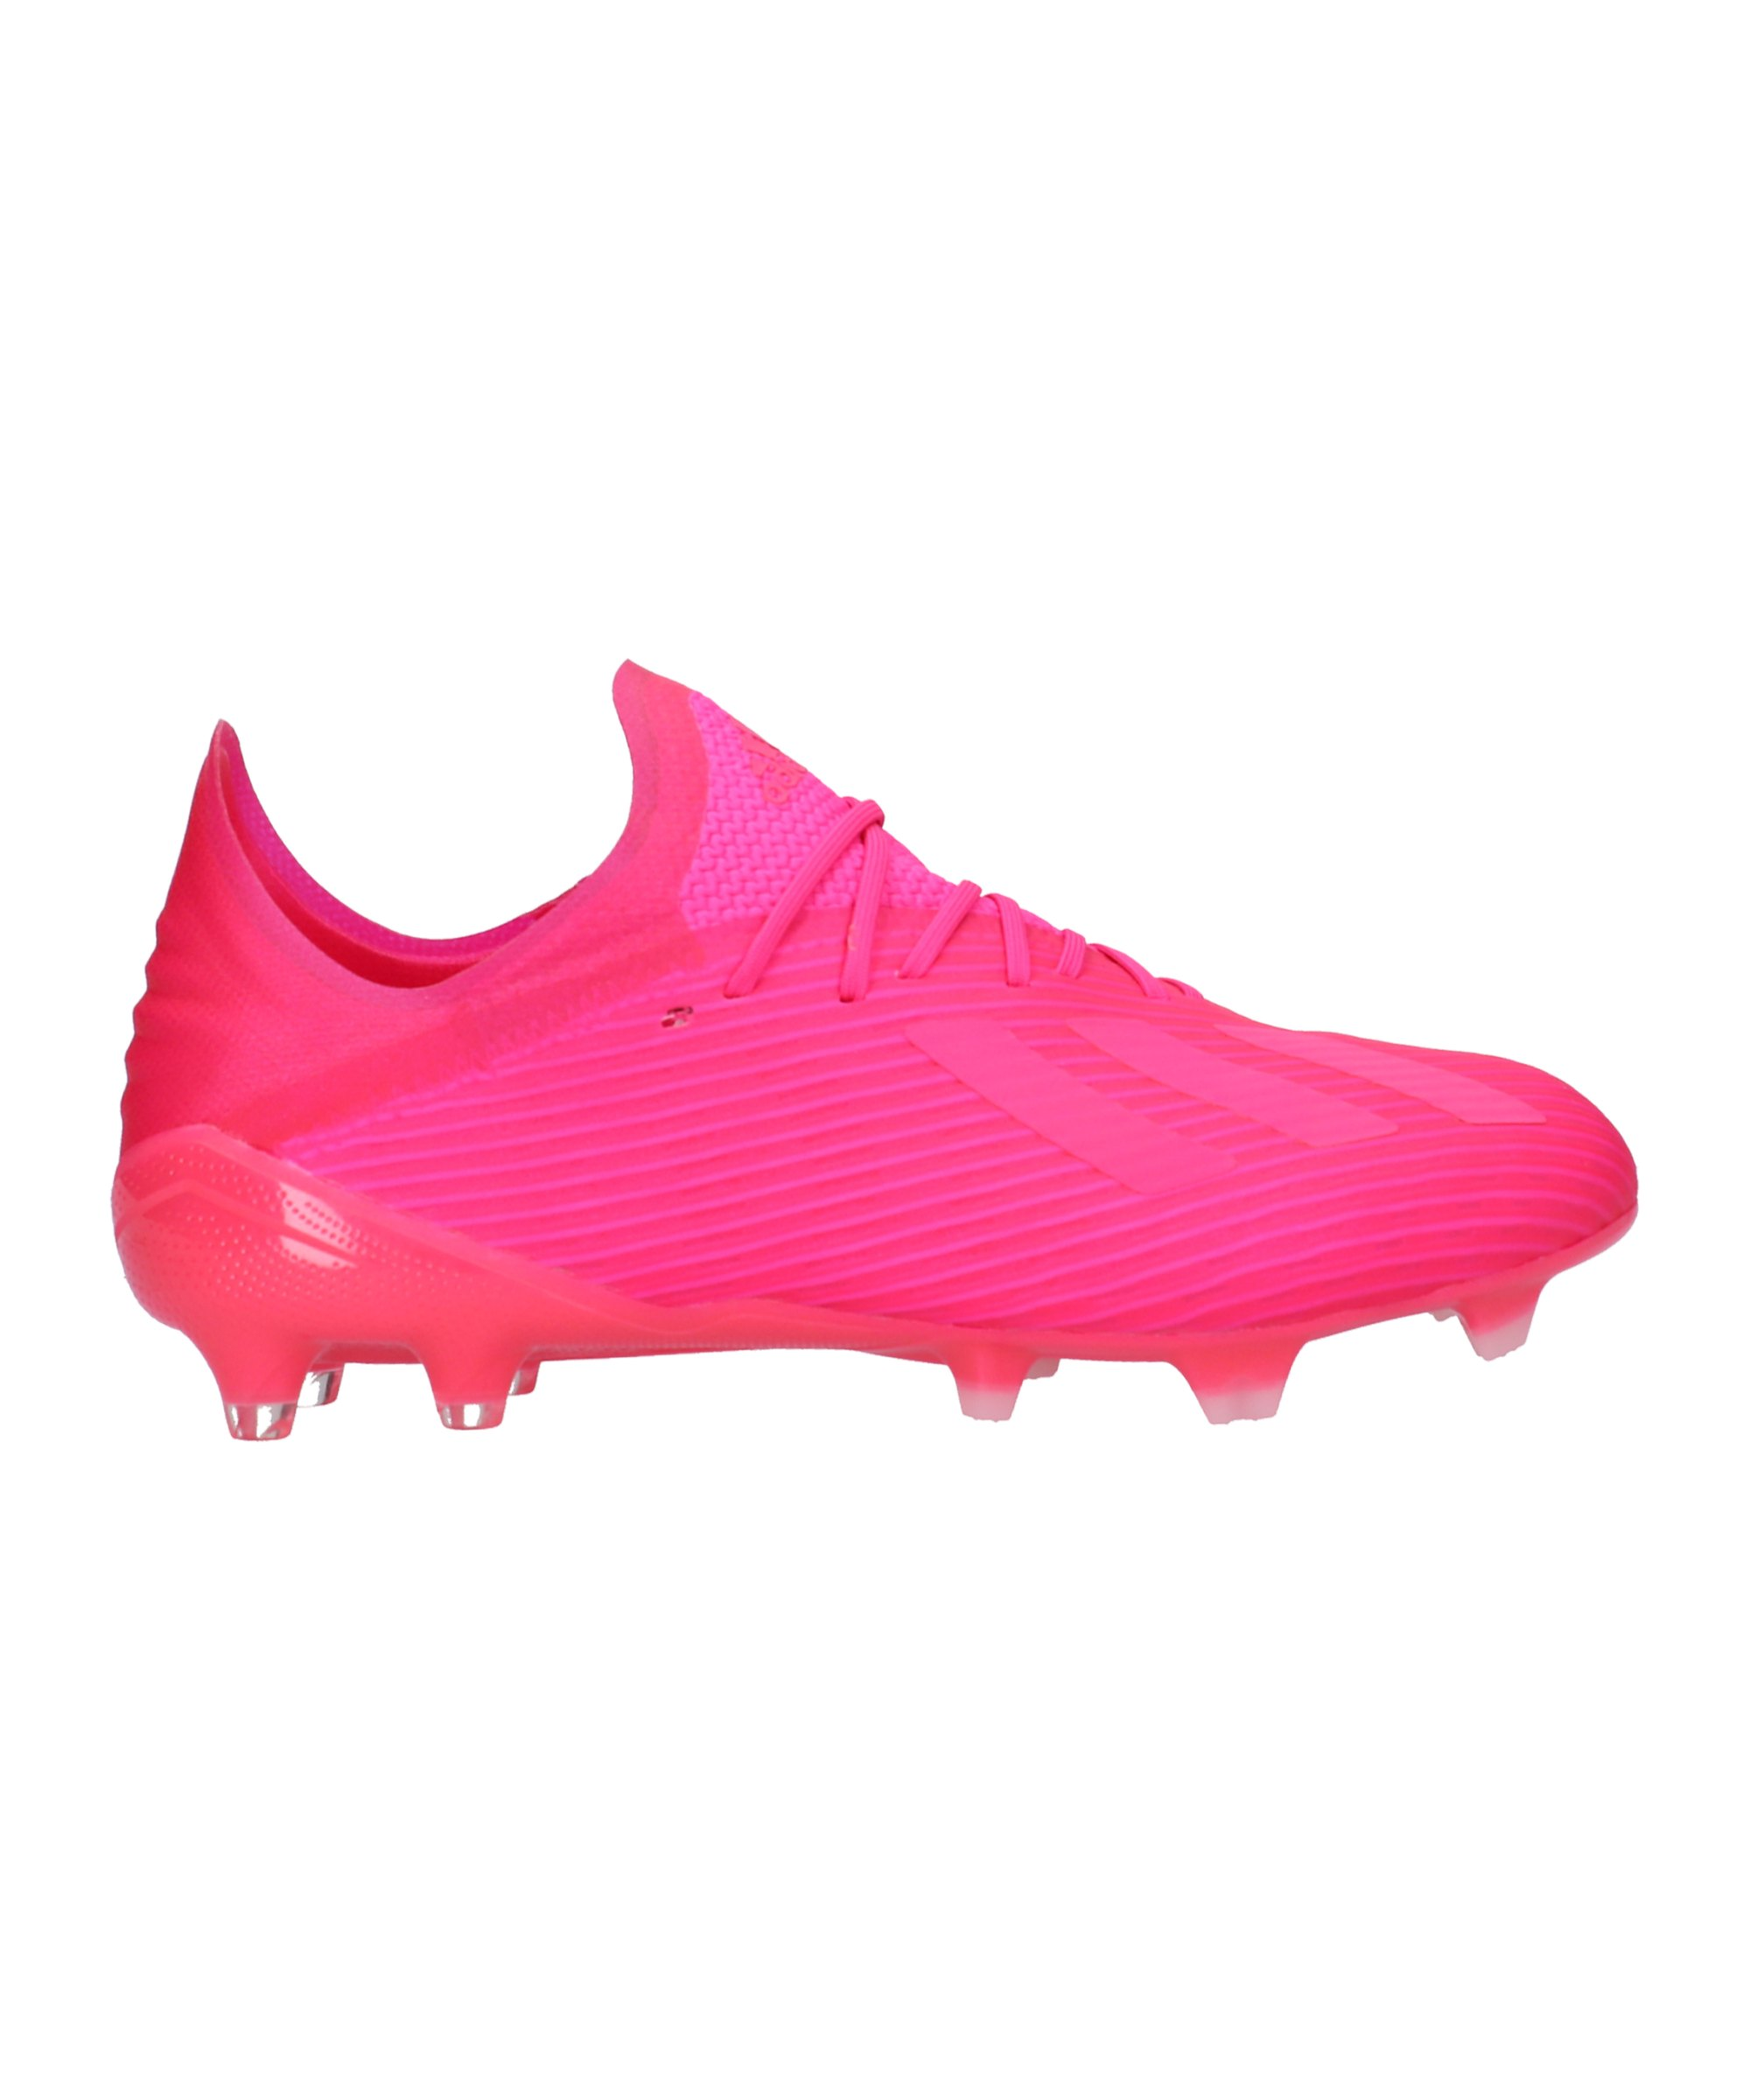 adidas X Locality 19.1 FG Pink - pink